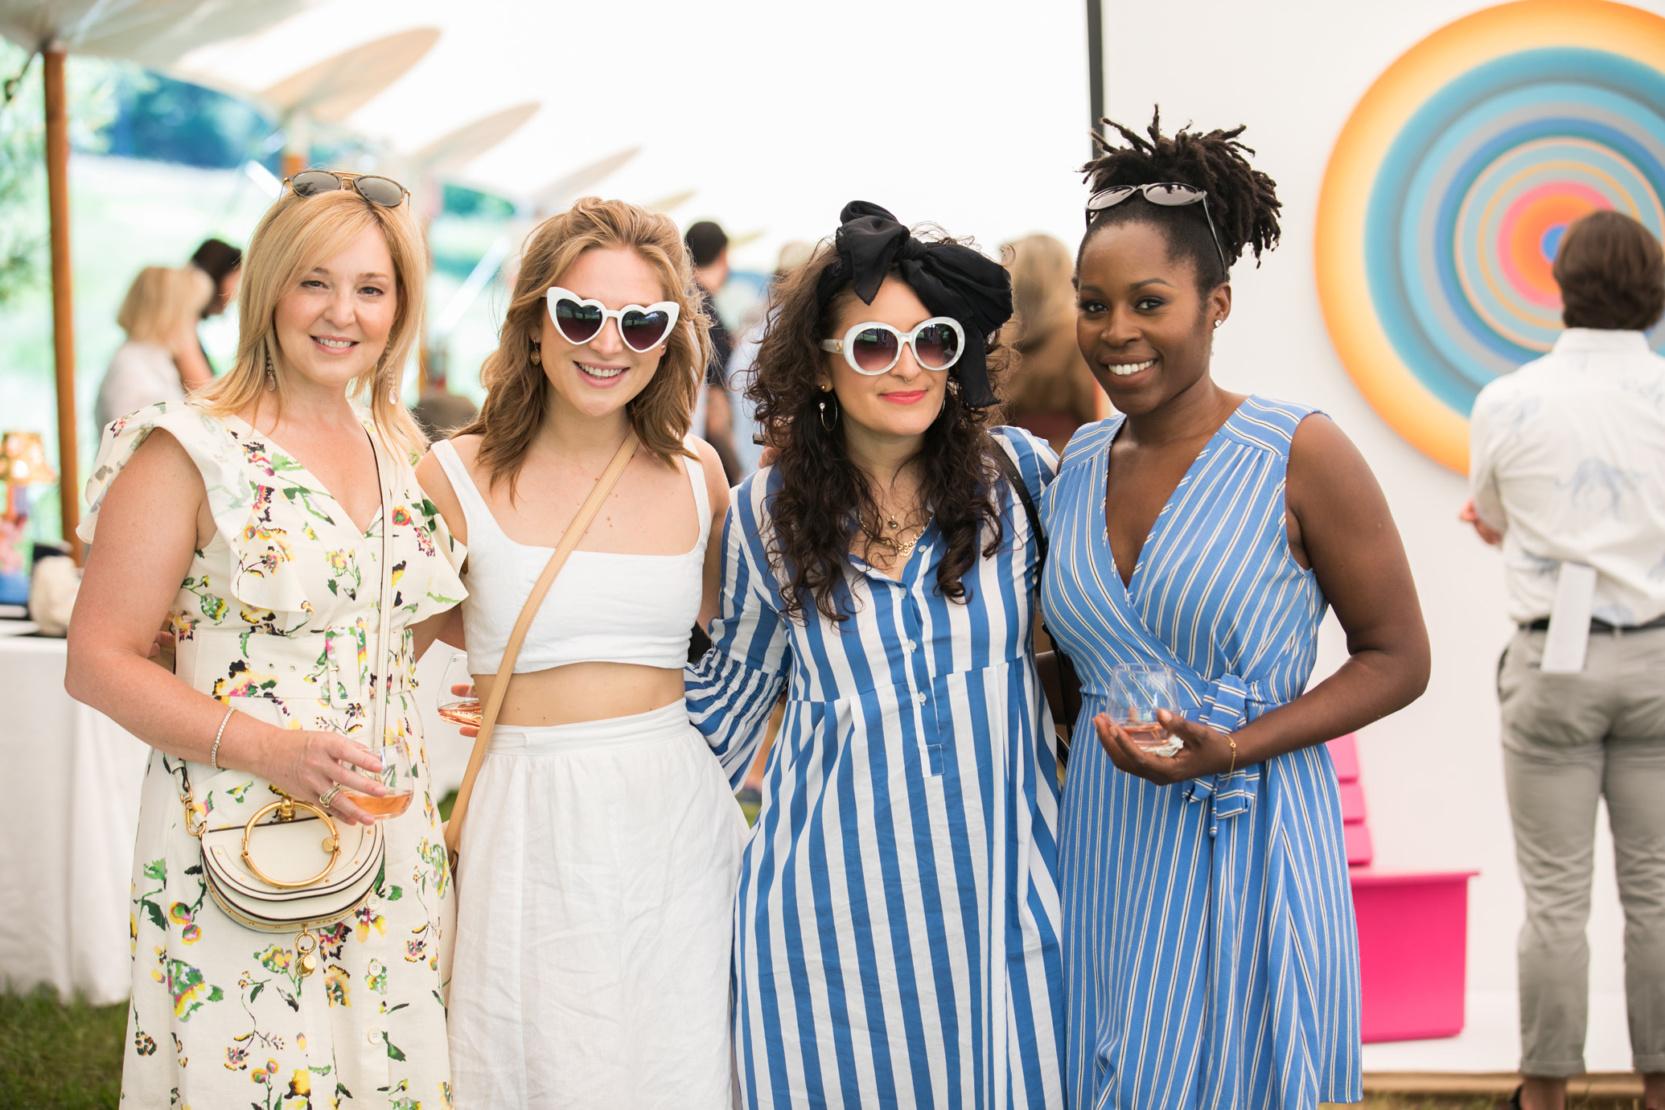 Laura Barker, Allison Barker, Nathalie Charria and Lola Adesioye